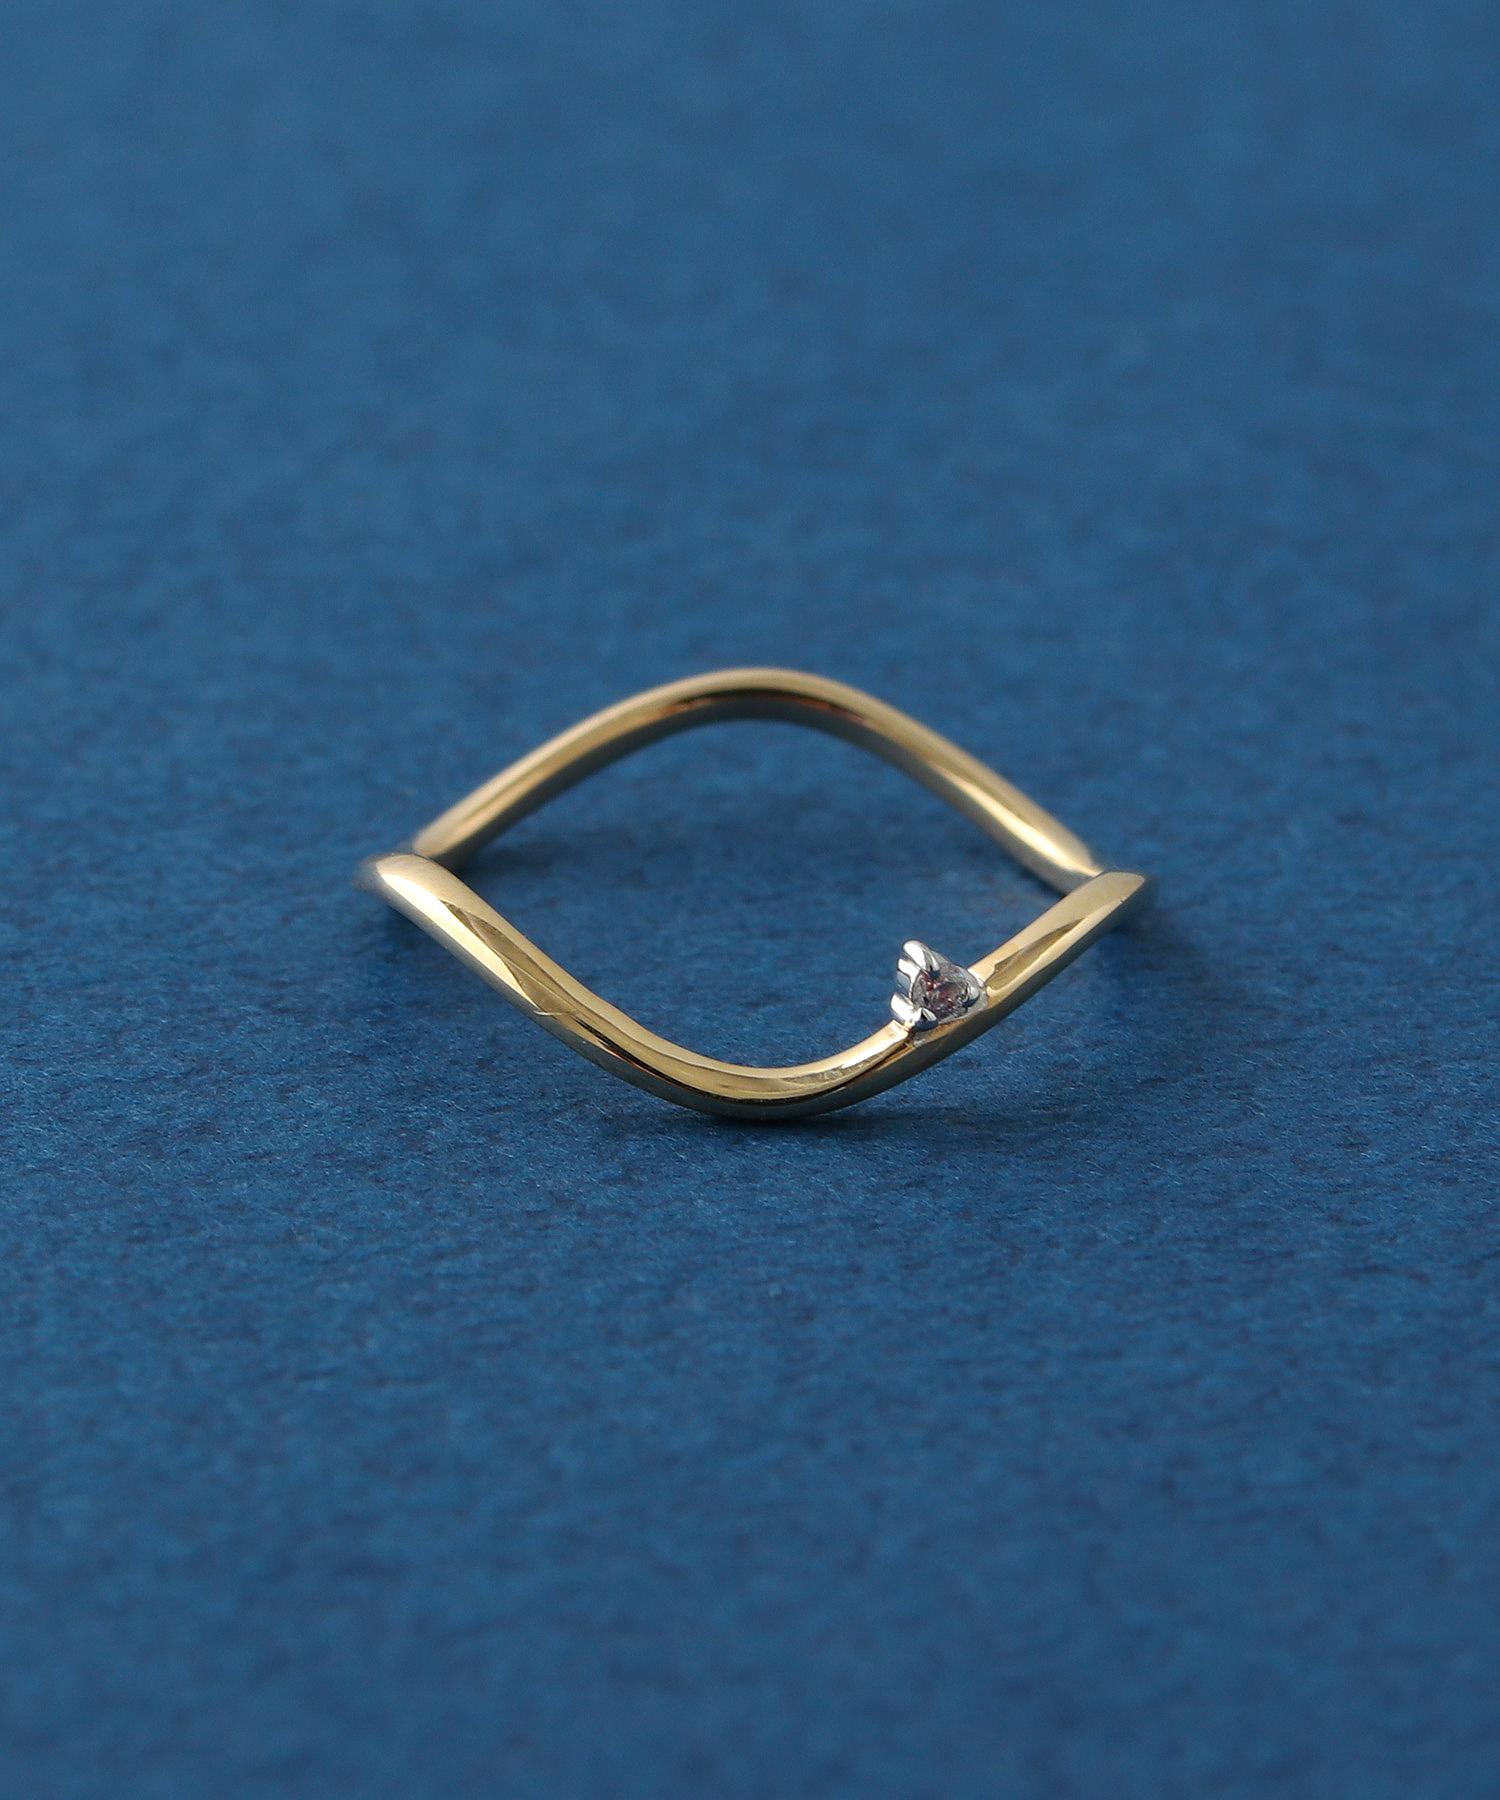 2018 Xmas Limited 【ドリームデイ】K10×ダイヤモンド ピンキーリングの写真